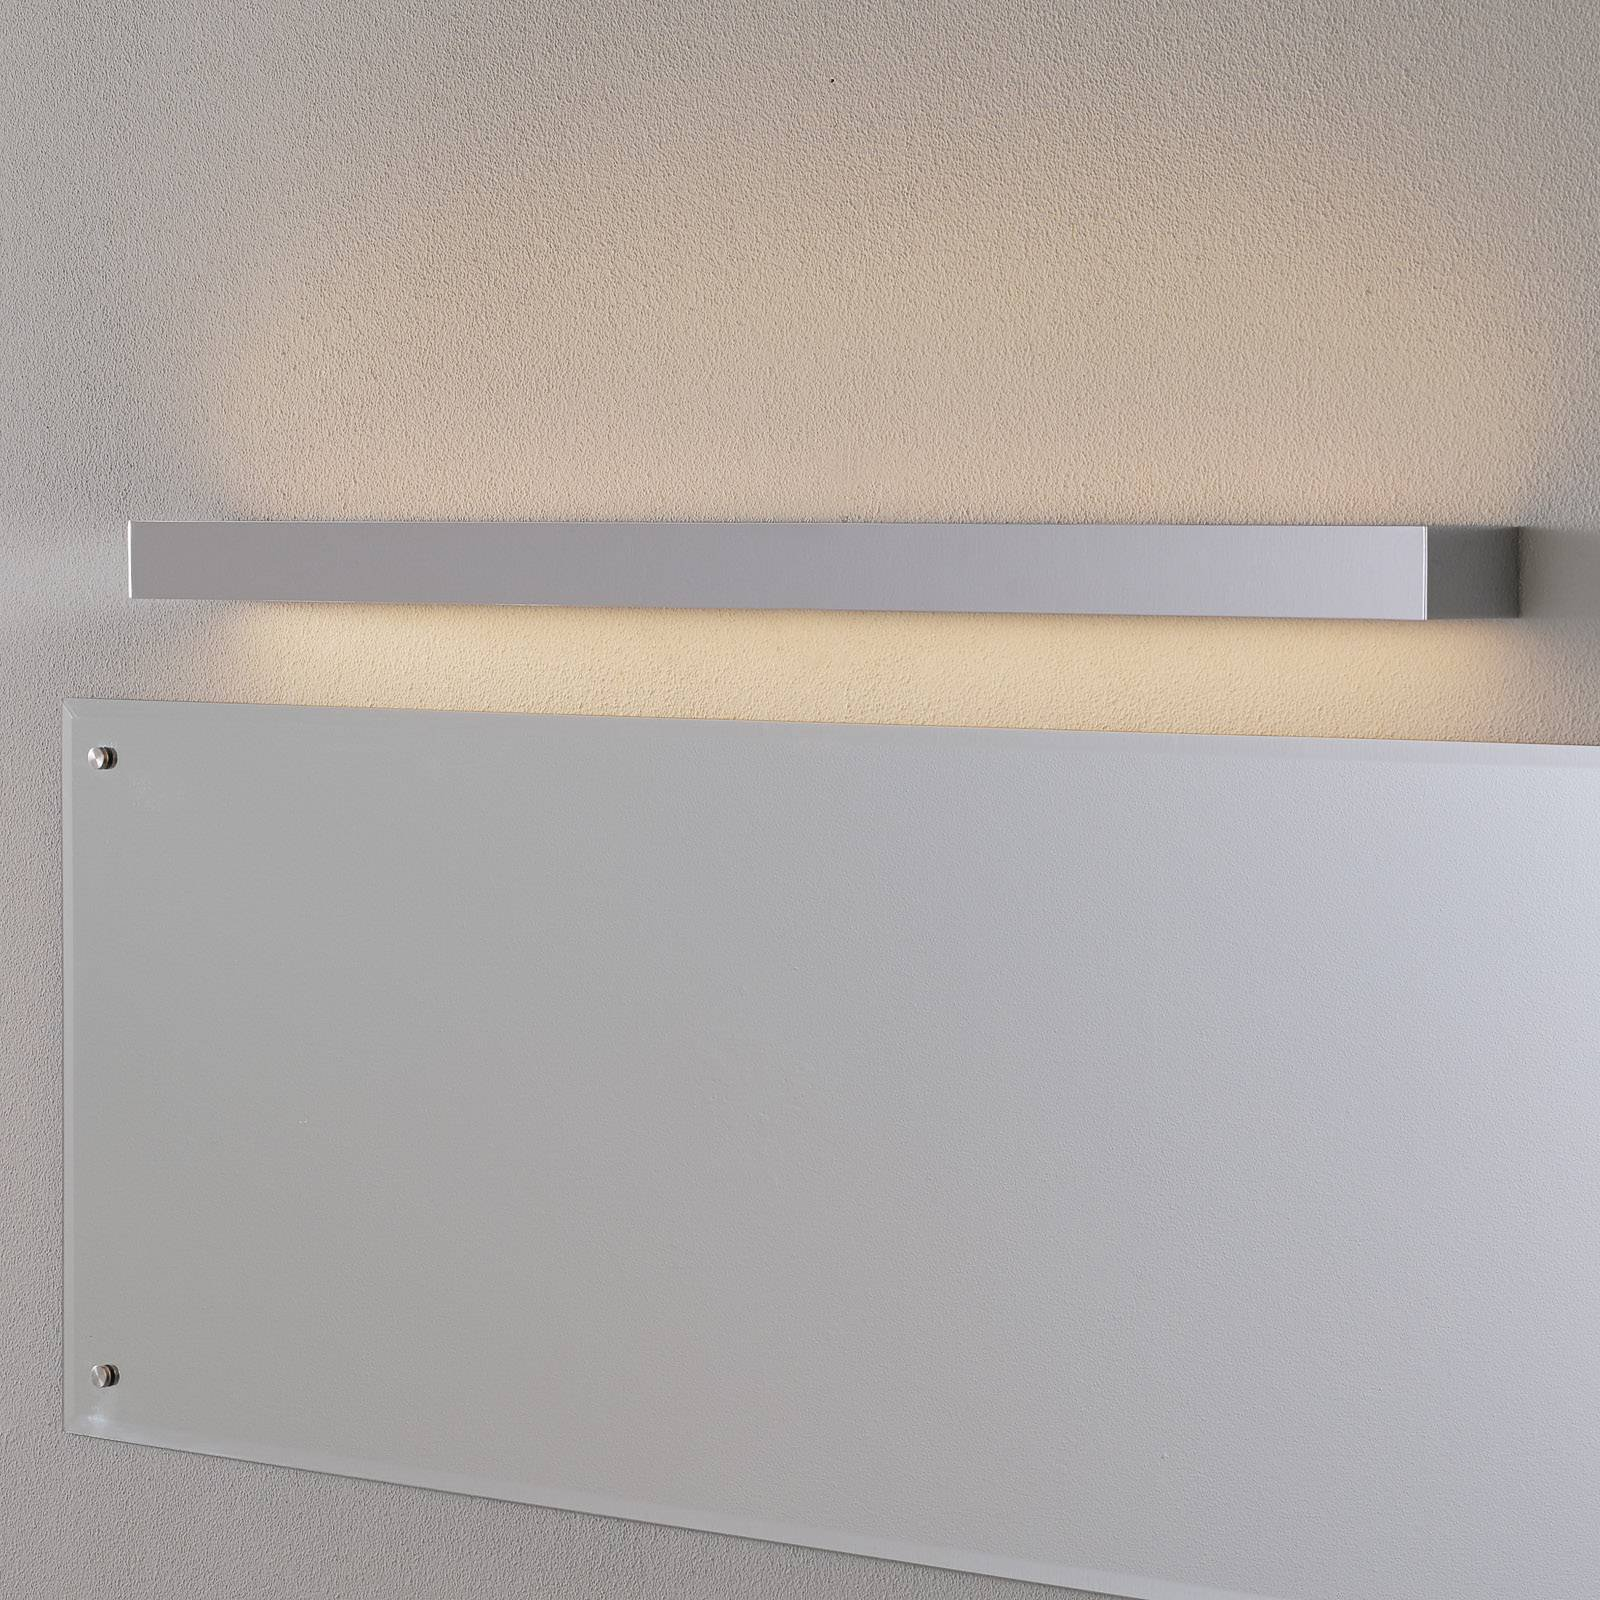 Helestra Theia LED-speillampe, forkrommet, 90 cm